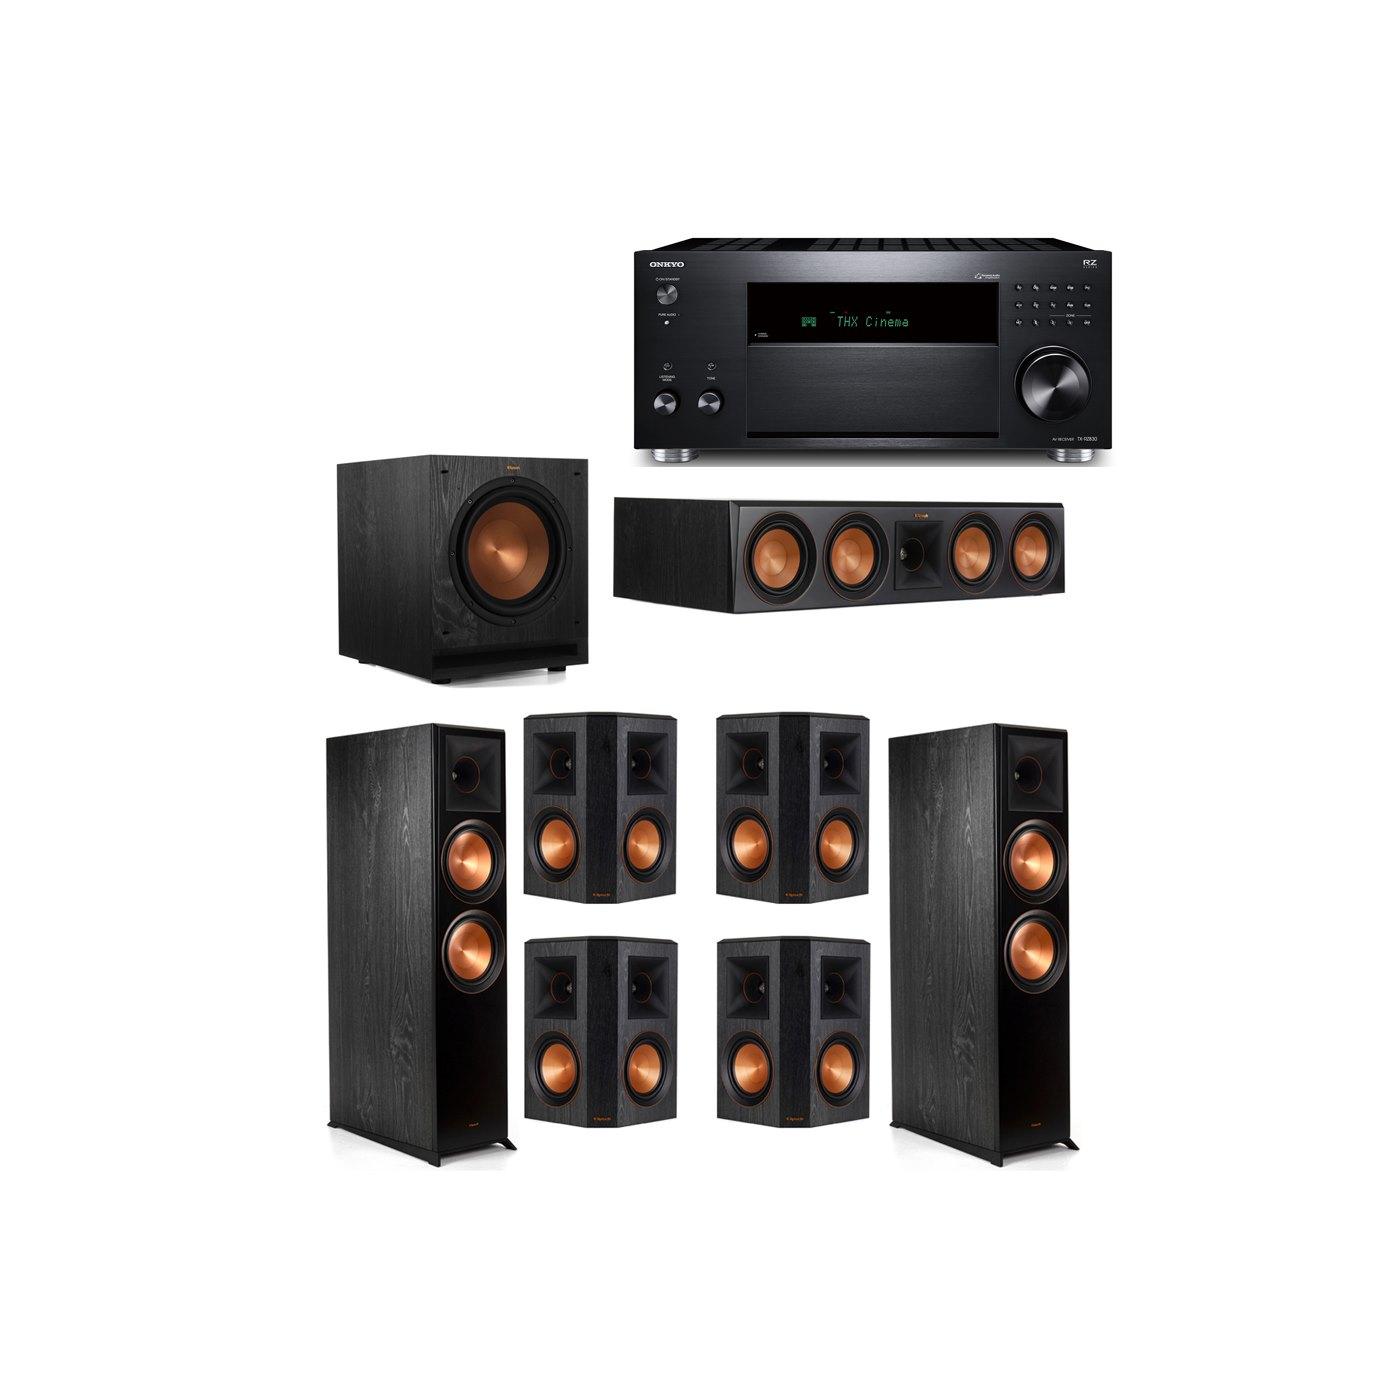 Klipsch 7.1 System with 2 RP-8000F,  1 RP-504C, 4 RP-502S, 1 SPL-100, 1 Onkyo TX-RZ830 Receiver